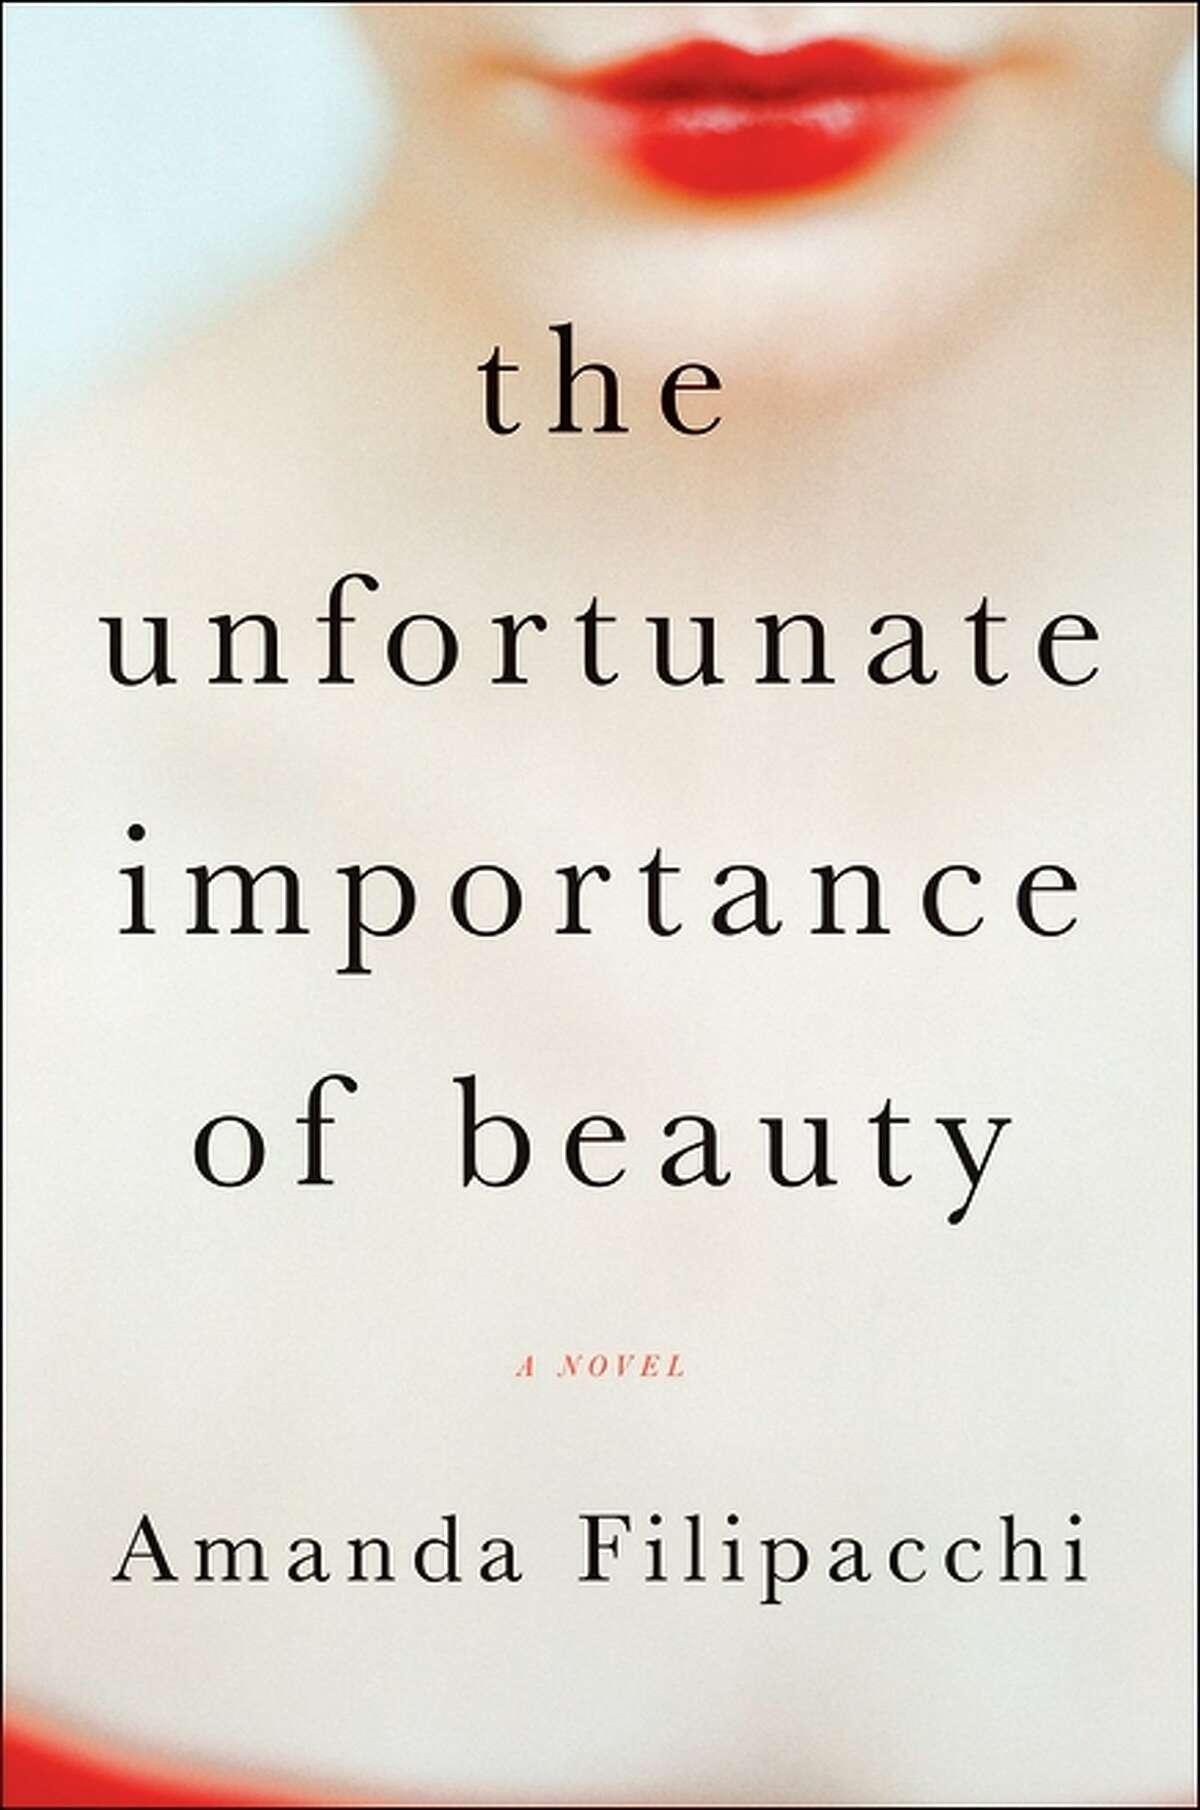 """The Unfortunate Importance of Beauty,"" by Amanda Filipacchi"